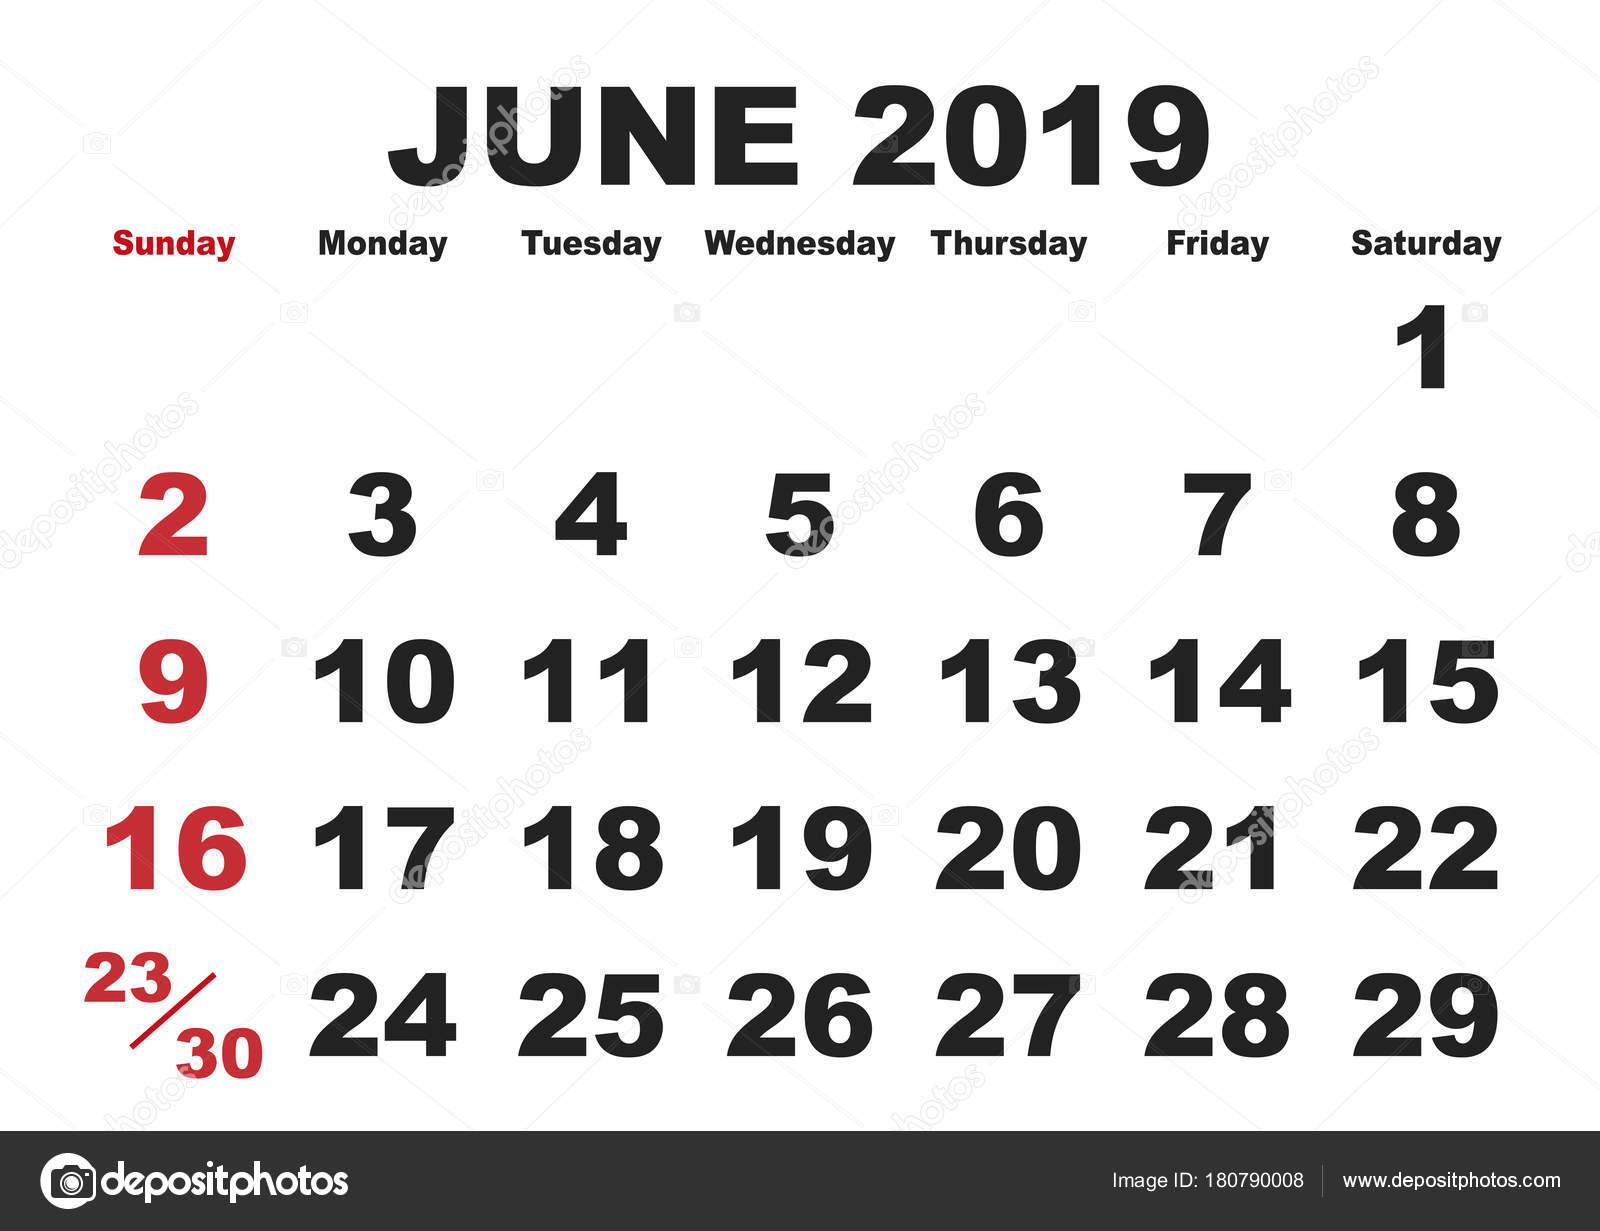 naptár 2019 június Június havi naptár 2019 angol nyelvváltozatban — Stock Vektor  naptár 2019 június